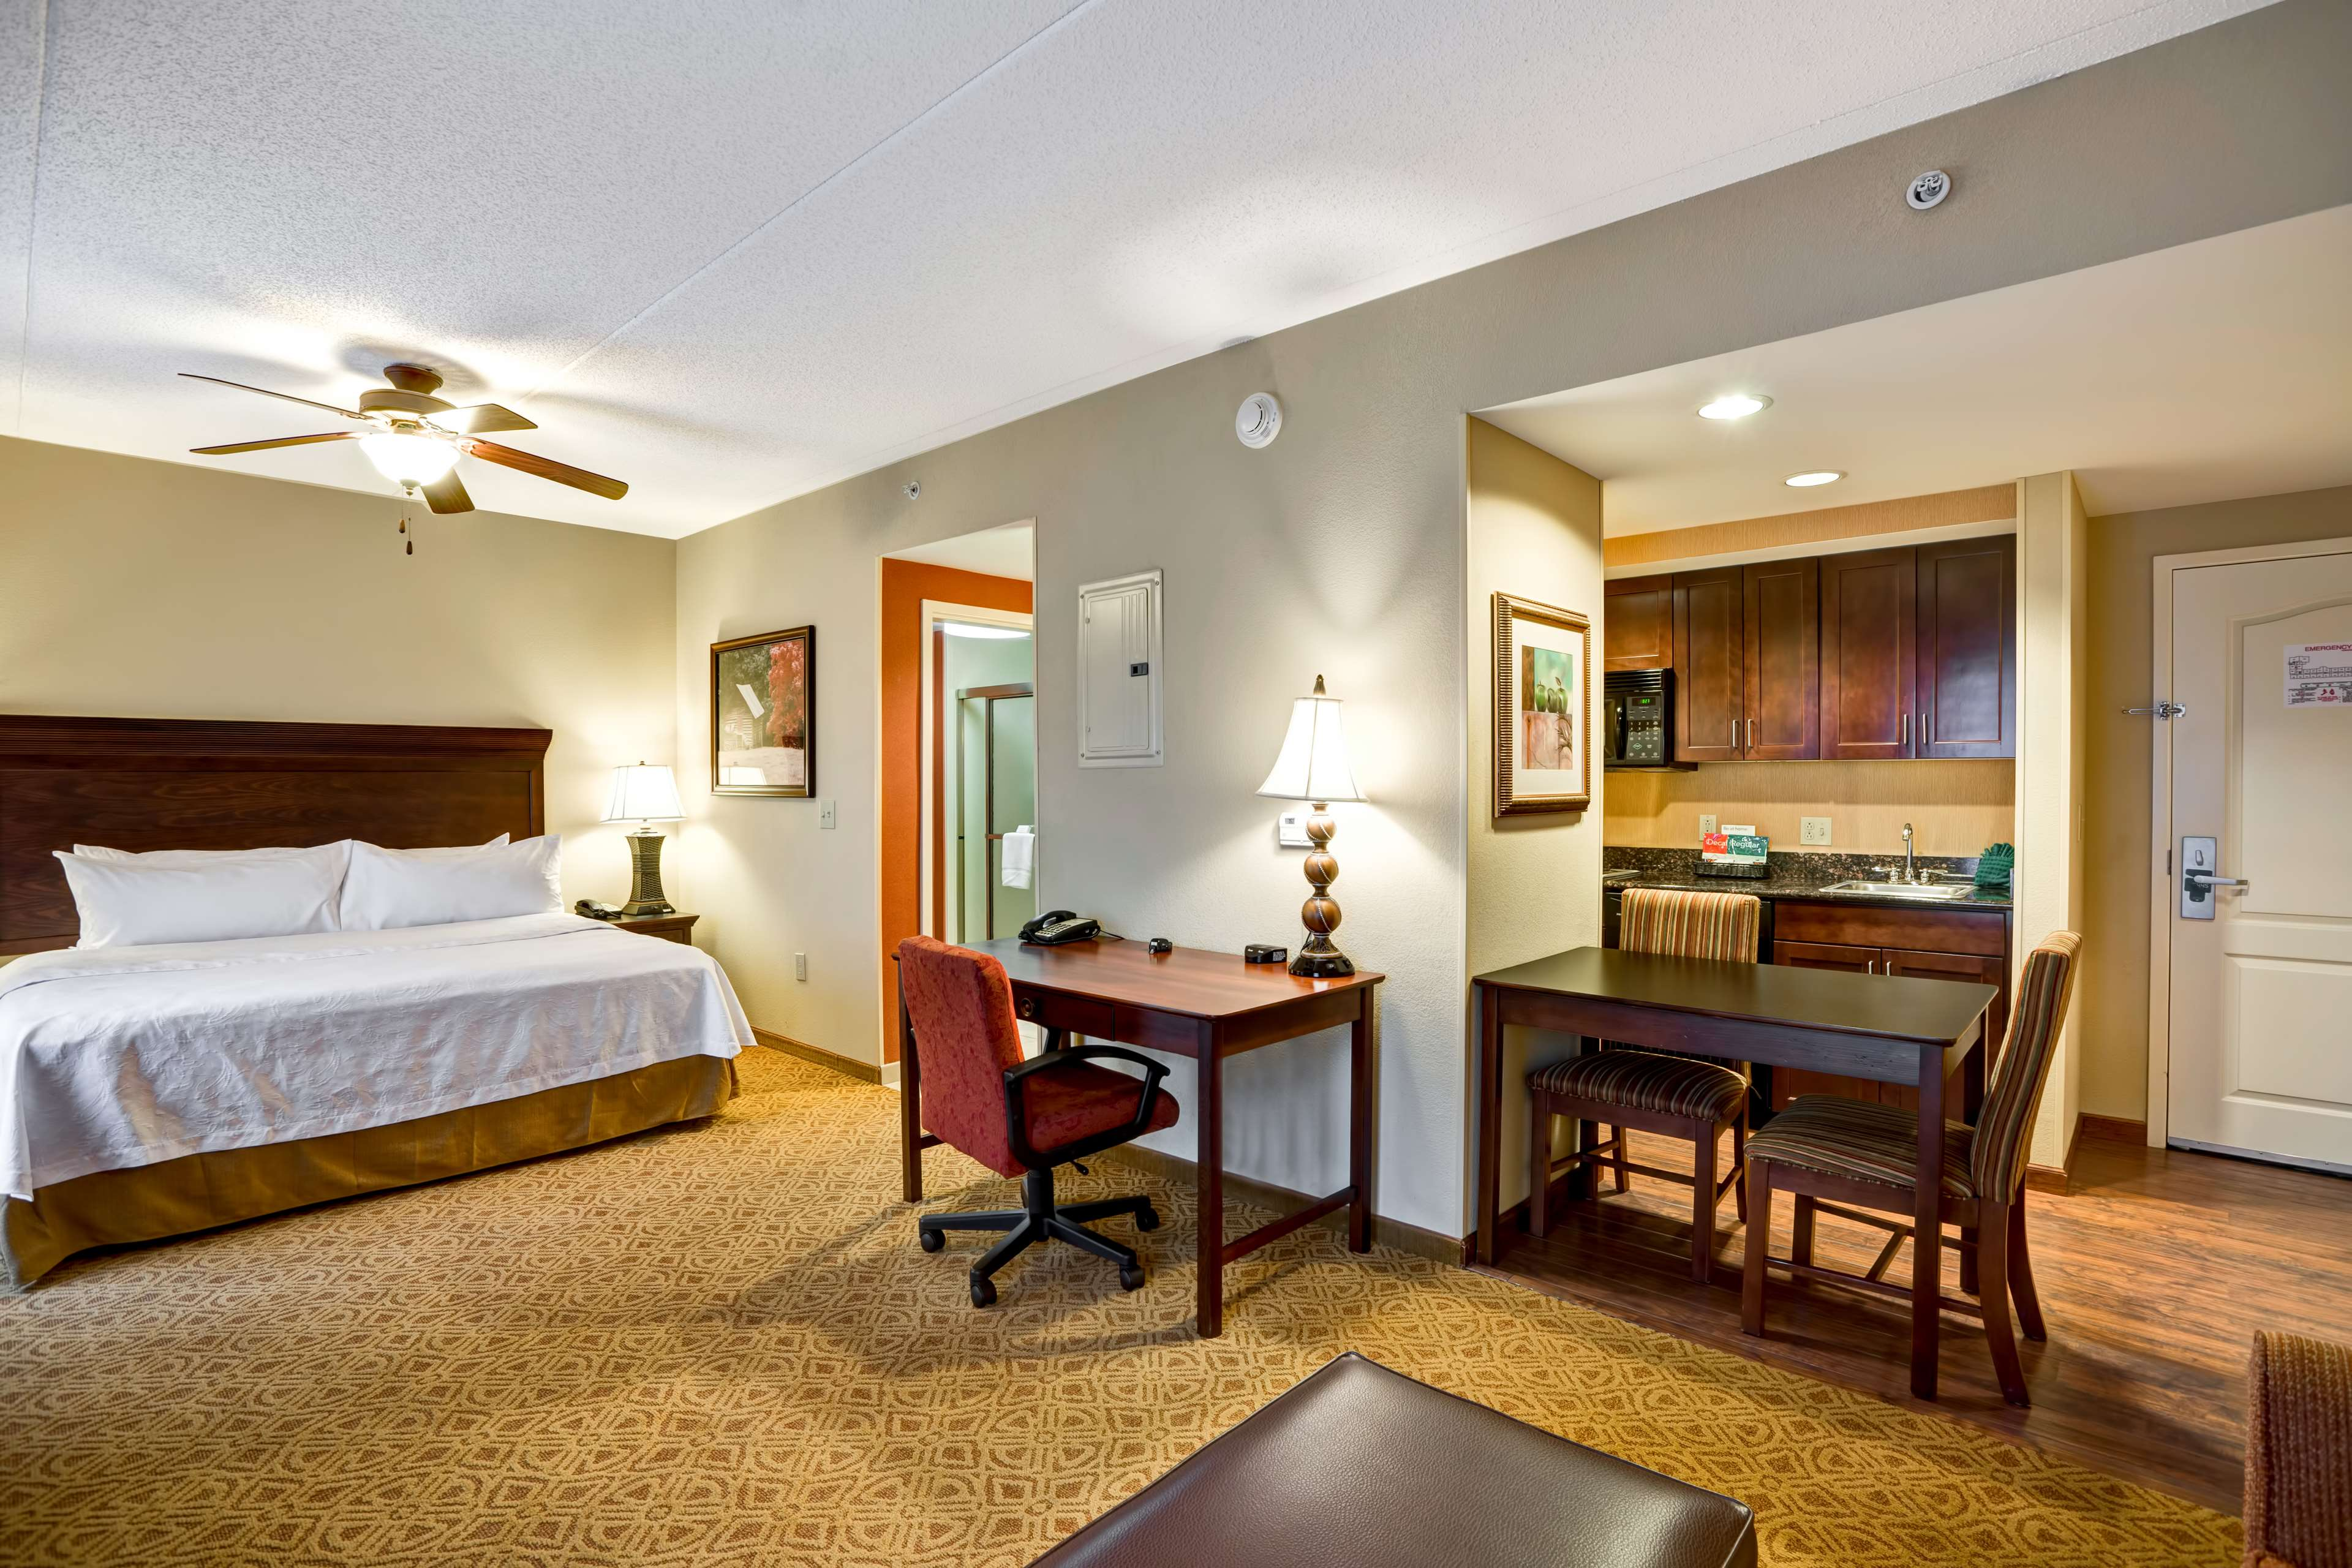 Homewood Suites by Hilton Fredericksburg image 21